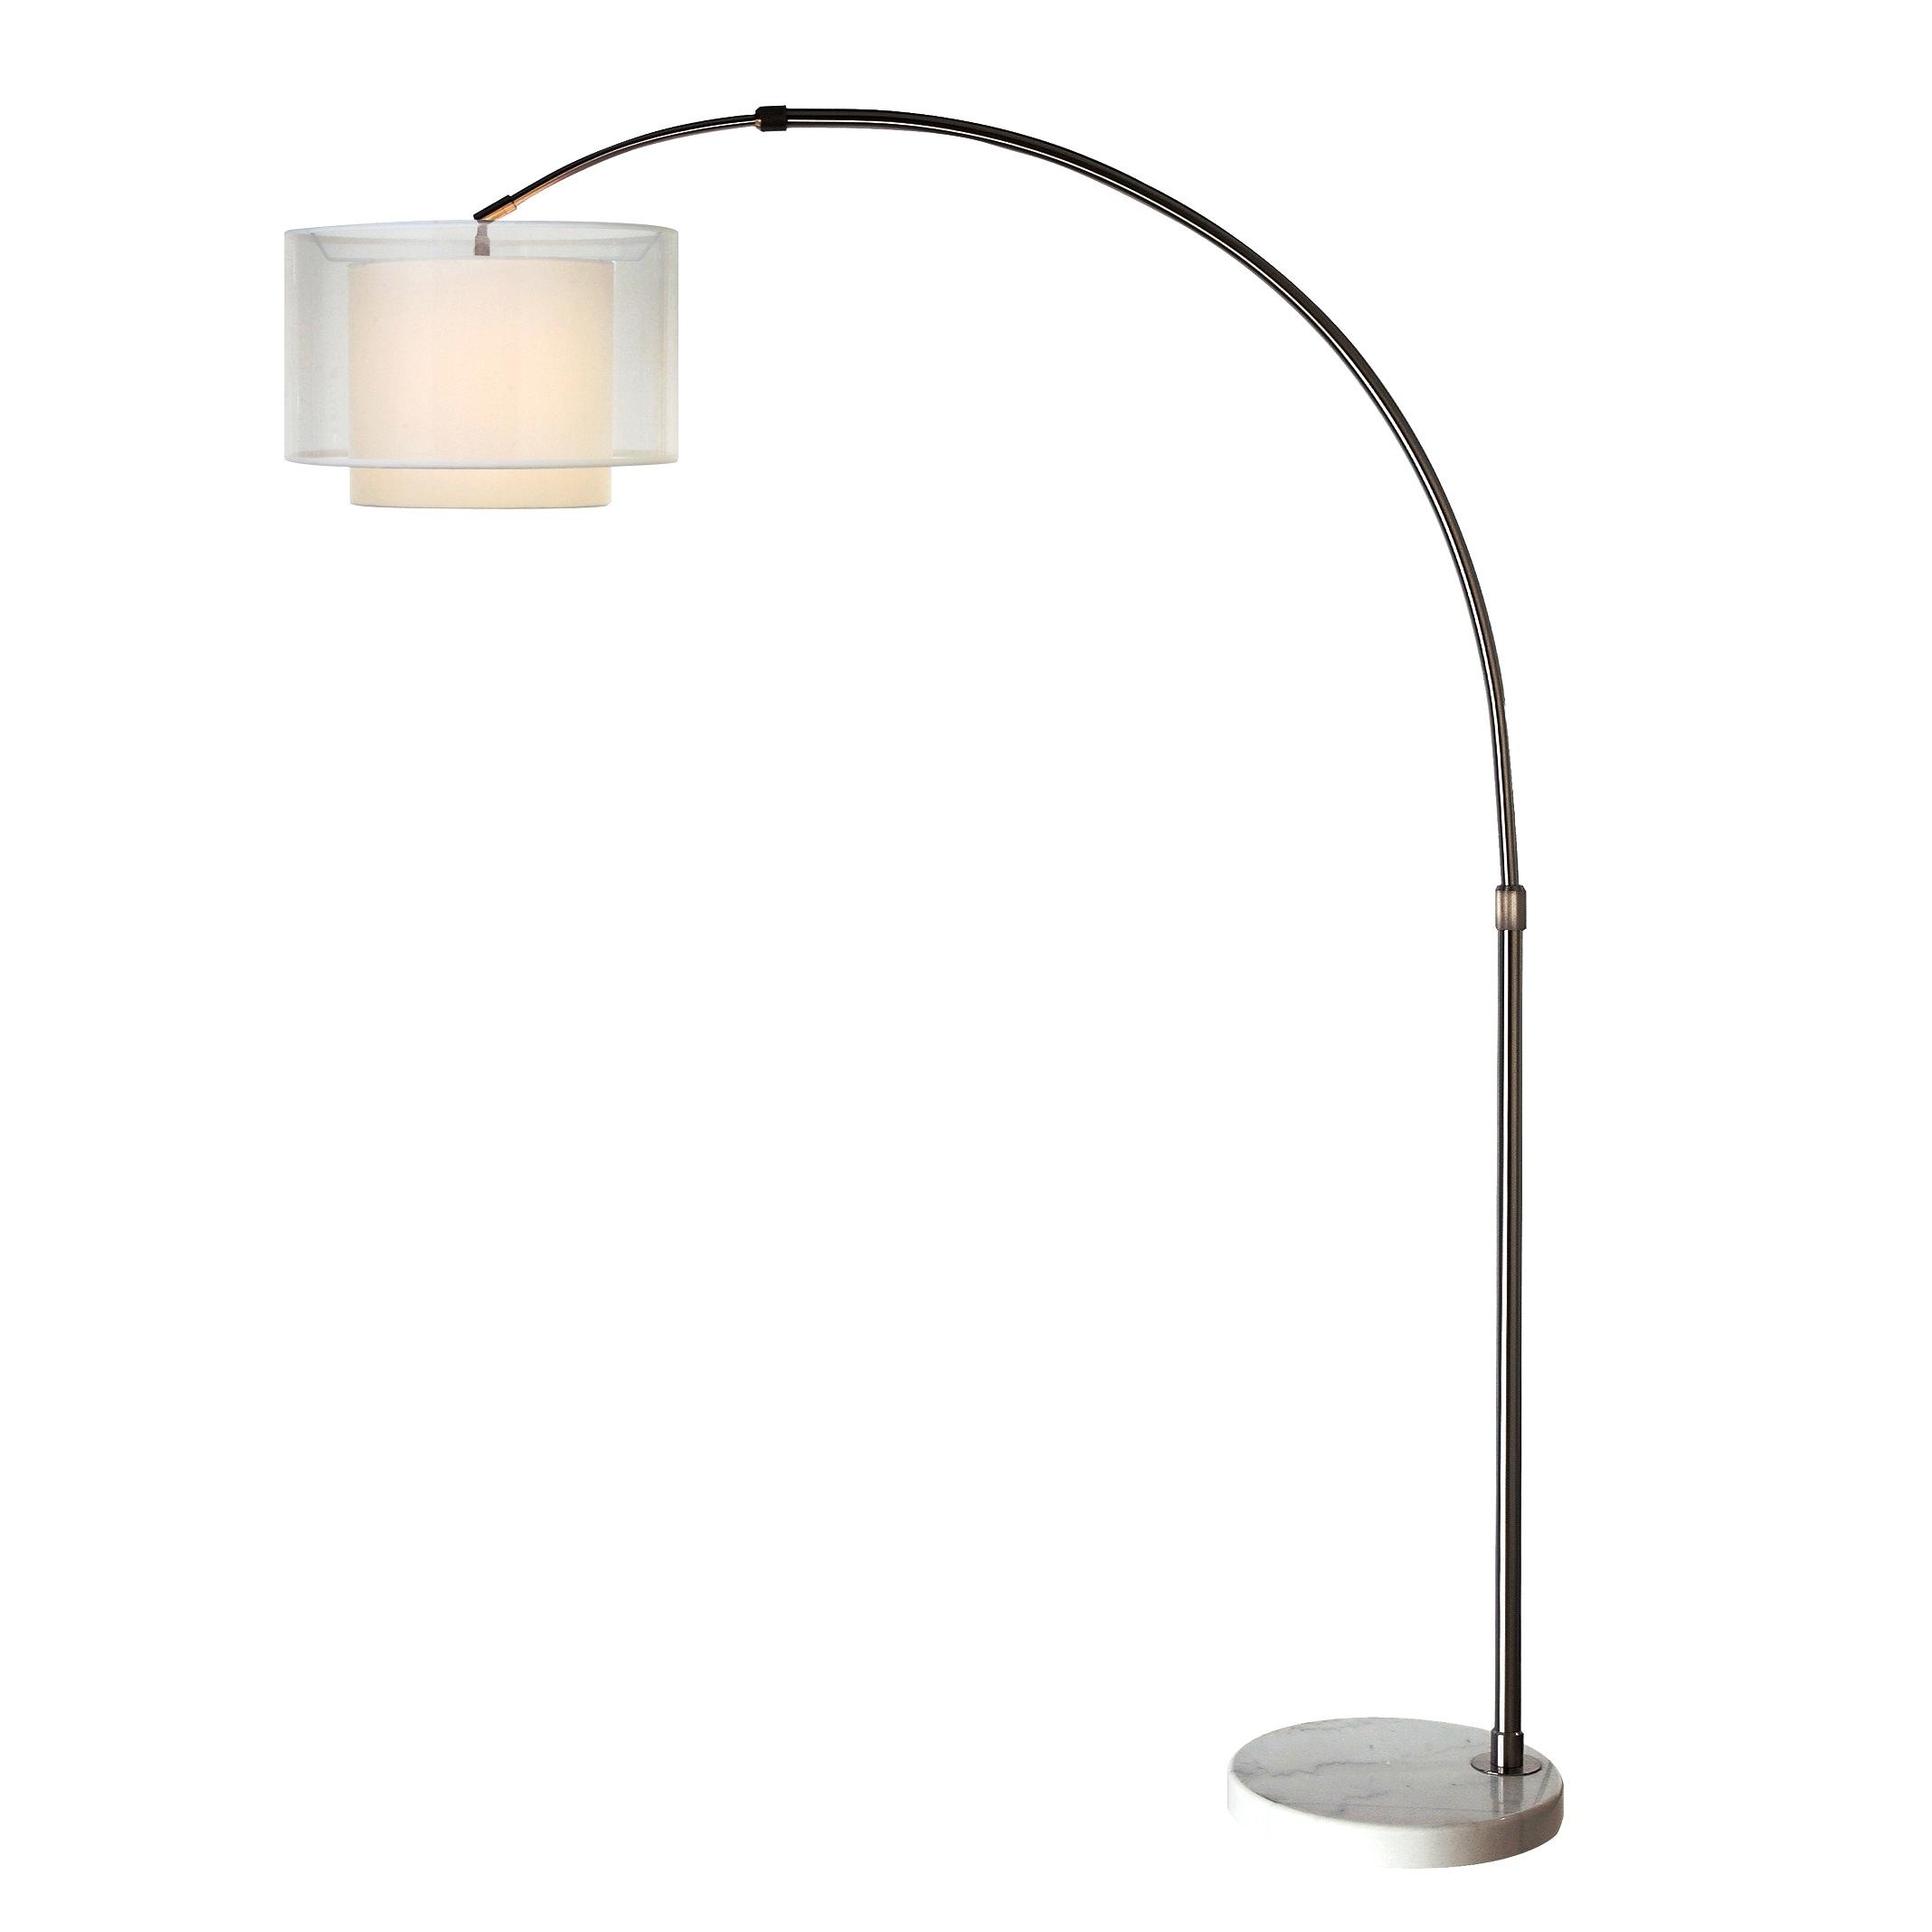 Trend Lighting Corp Brella Floor Lamp L Brilliant Source